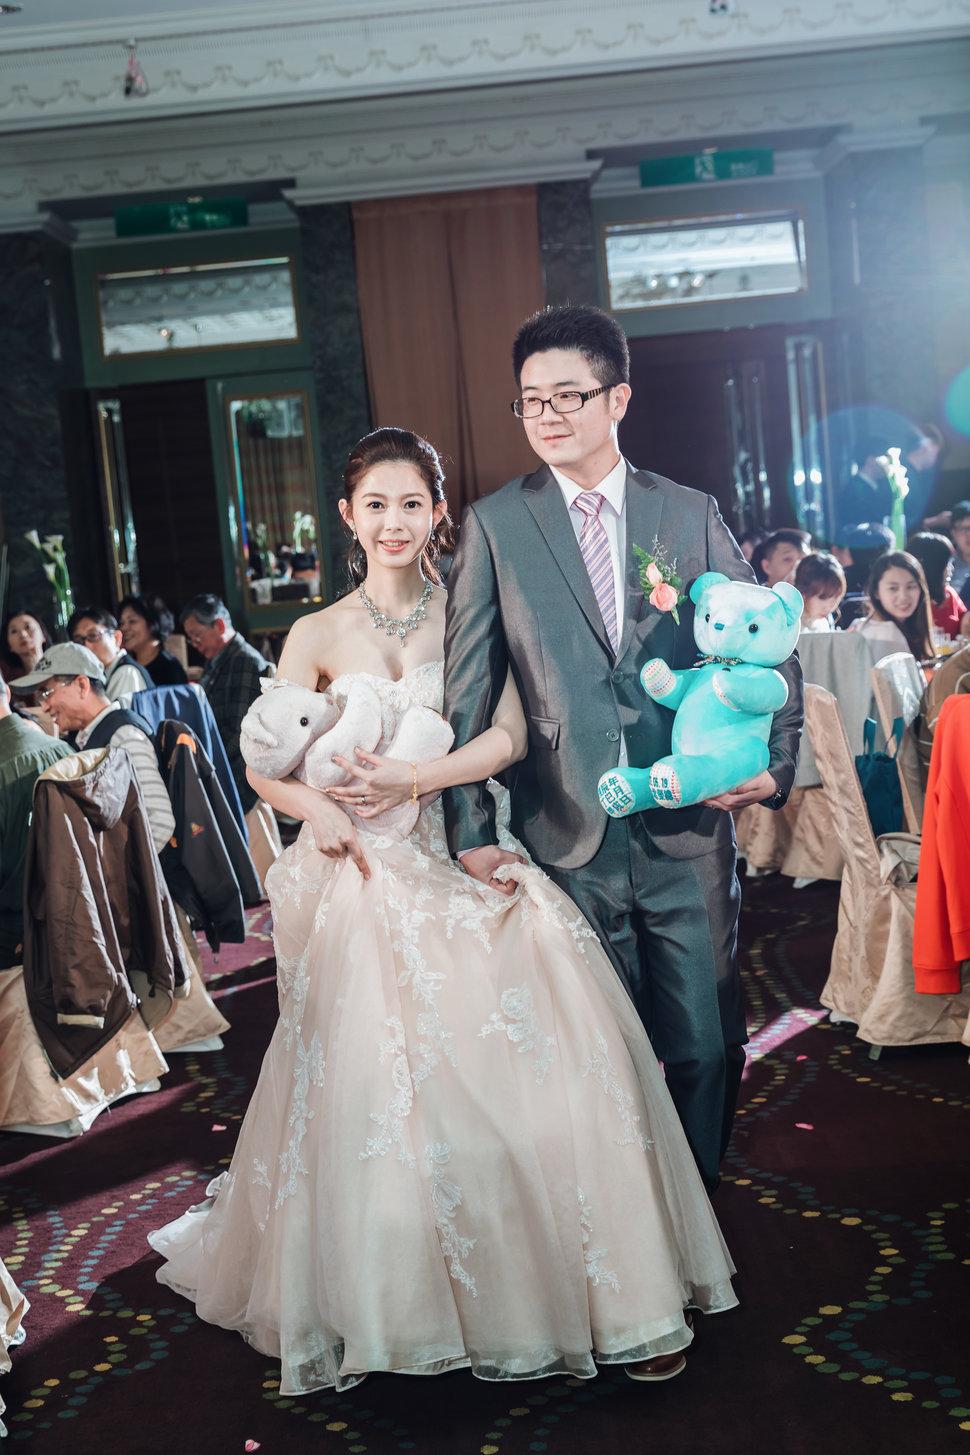 5D4_5452 - Promaker婚禮紀錄攝影團隊婚攝豪哥《結婚吧》